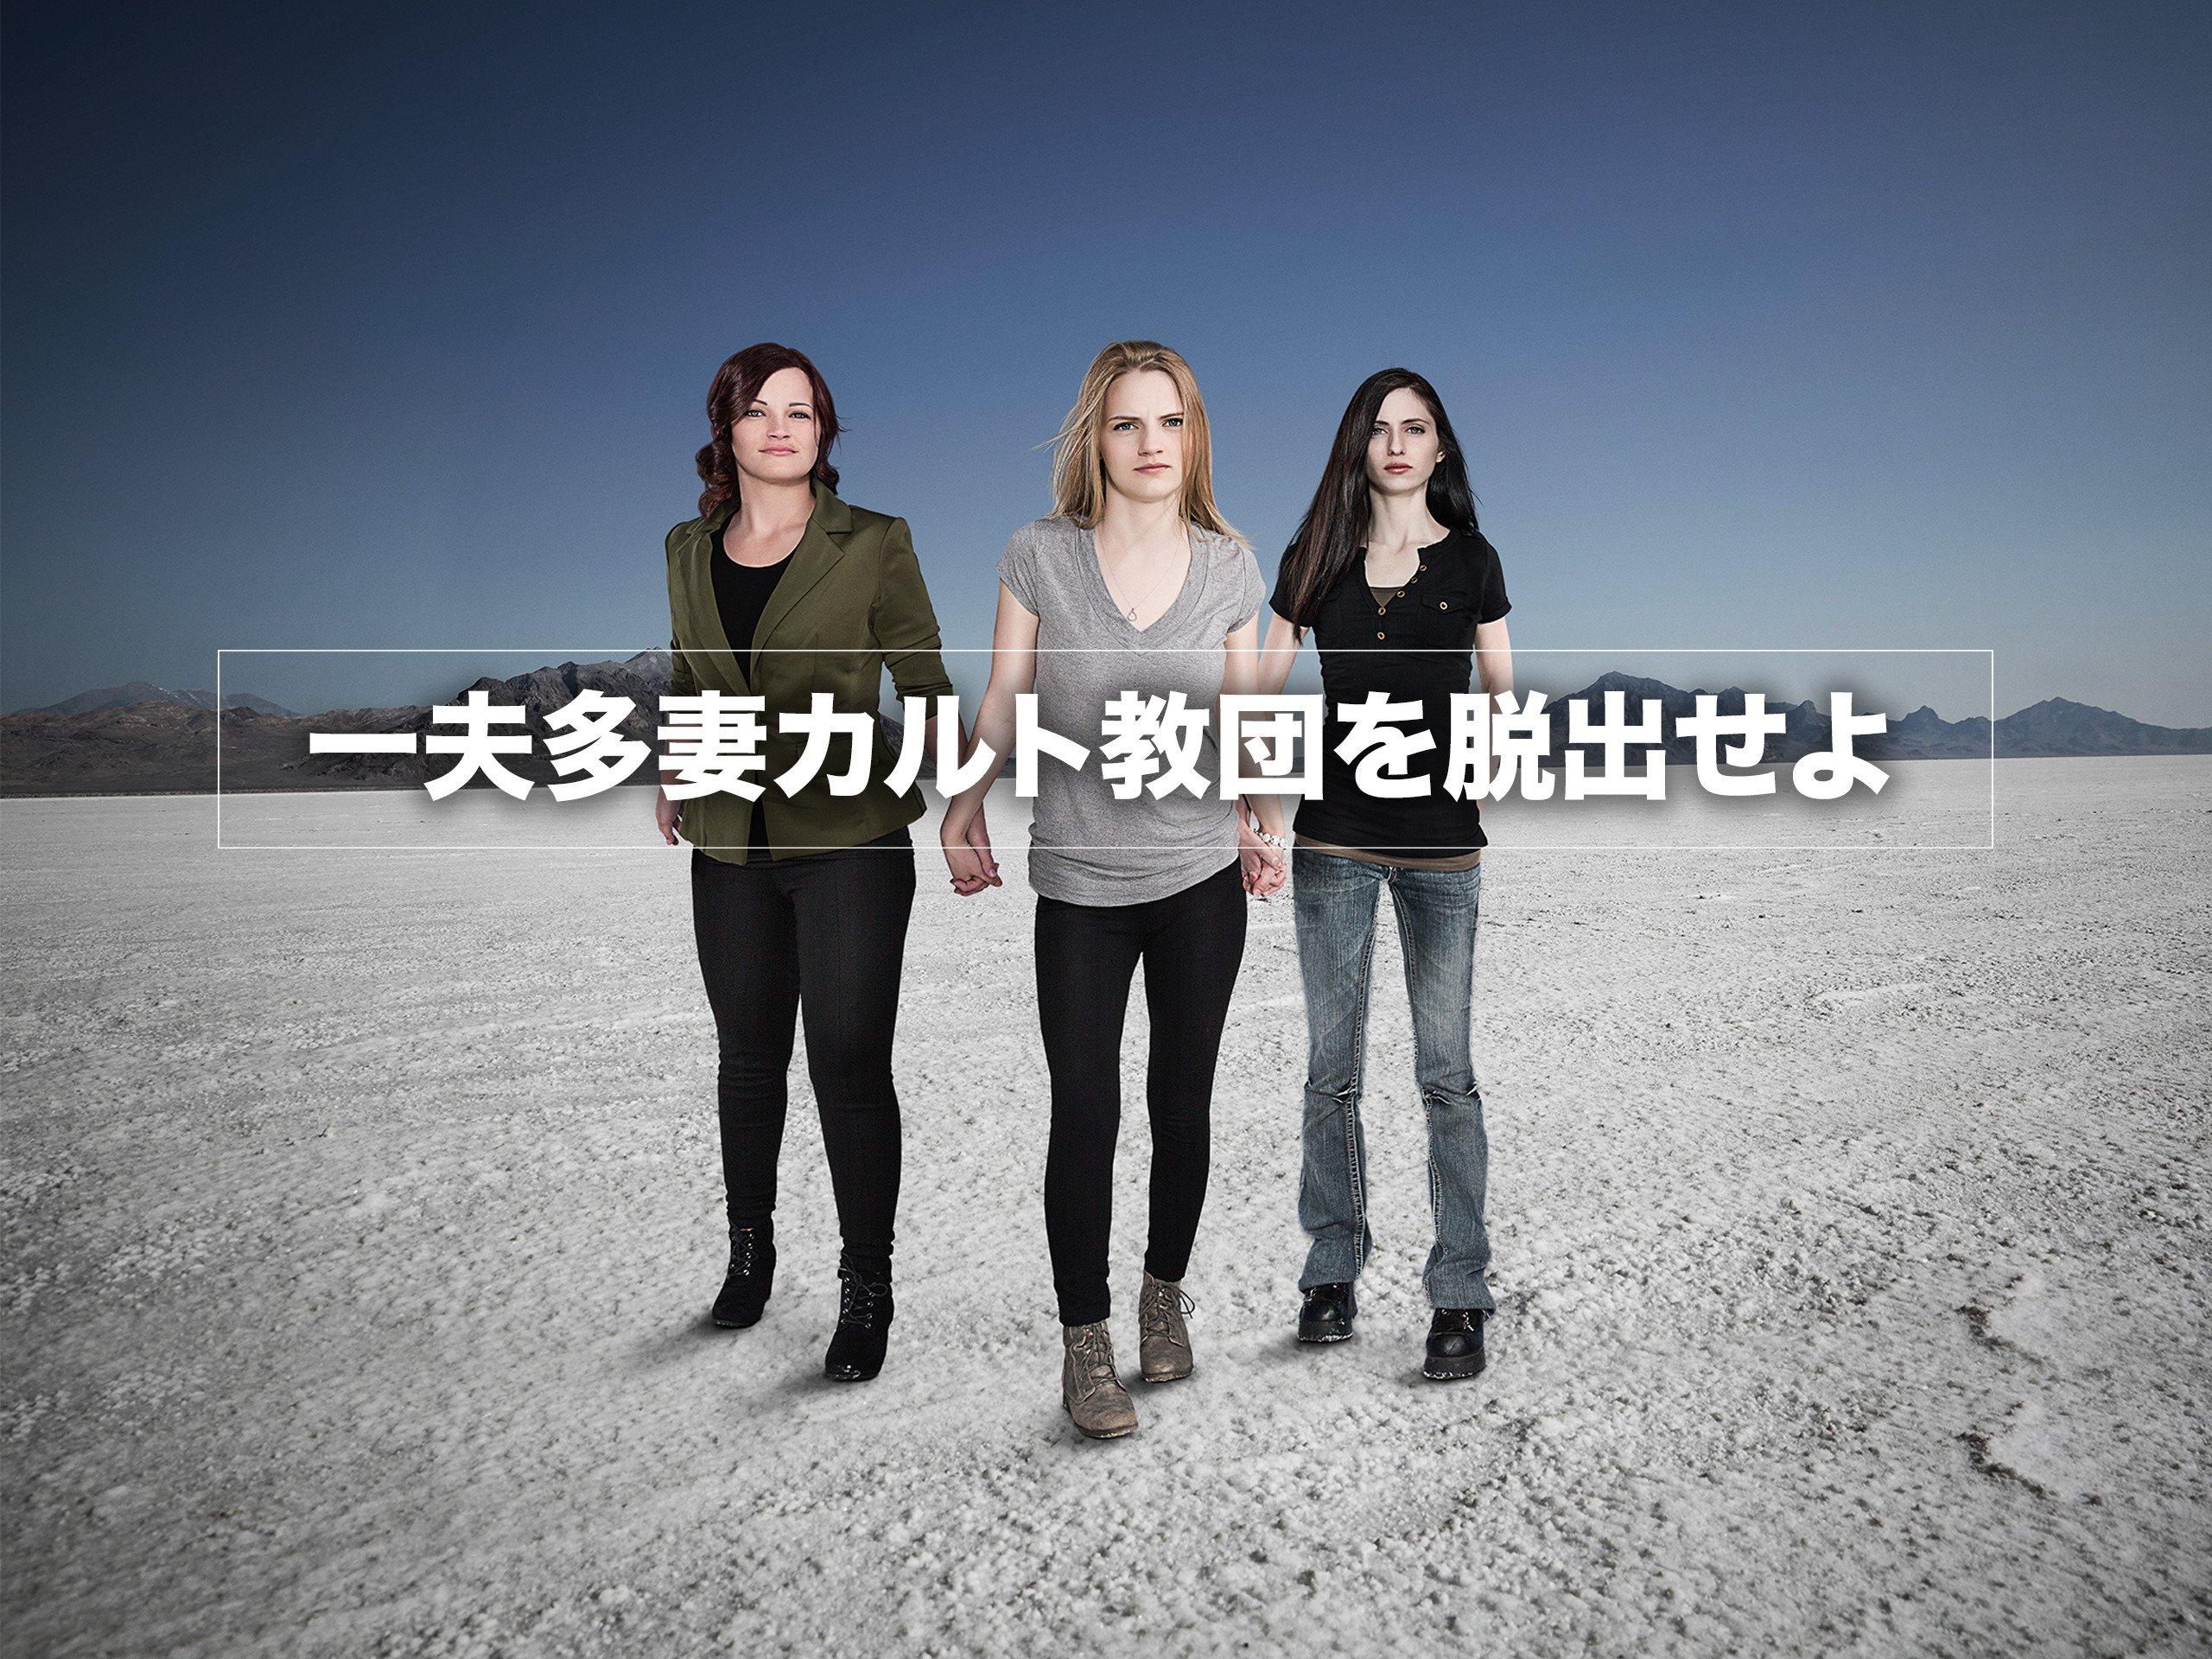 Amazon.co.jp: 一夫多妻カルト教団を脱出せよ シーズン1(字幕版): generic